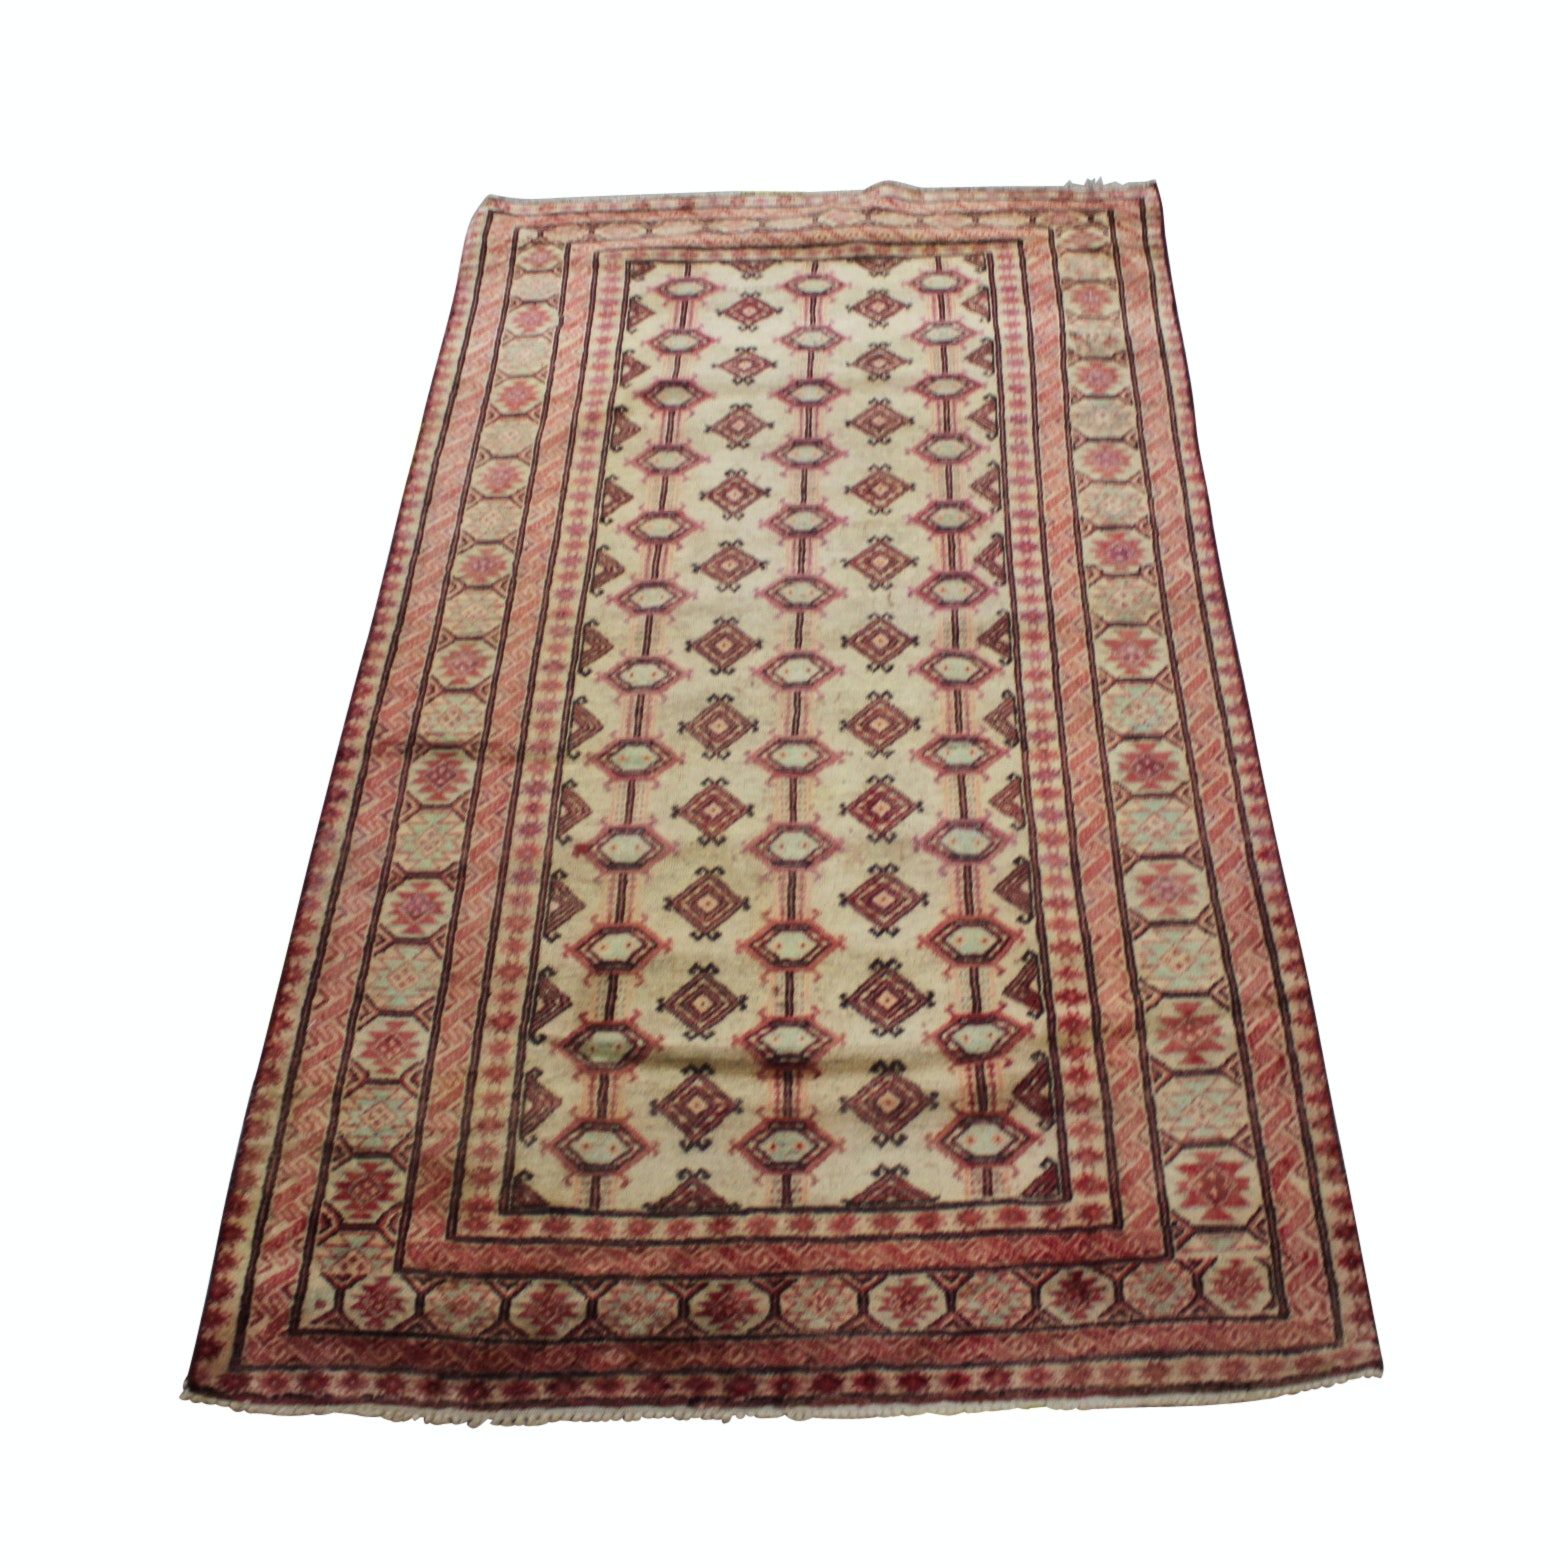 Hand-Knotted Persian Turkmen Heriz Wool Area Rug